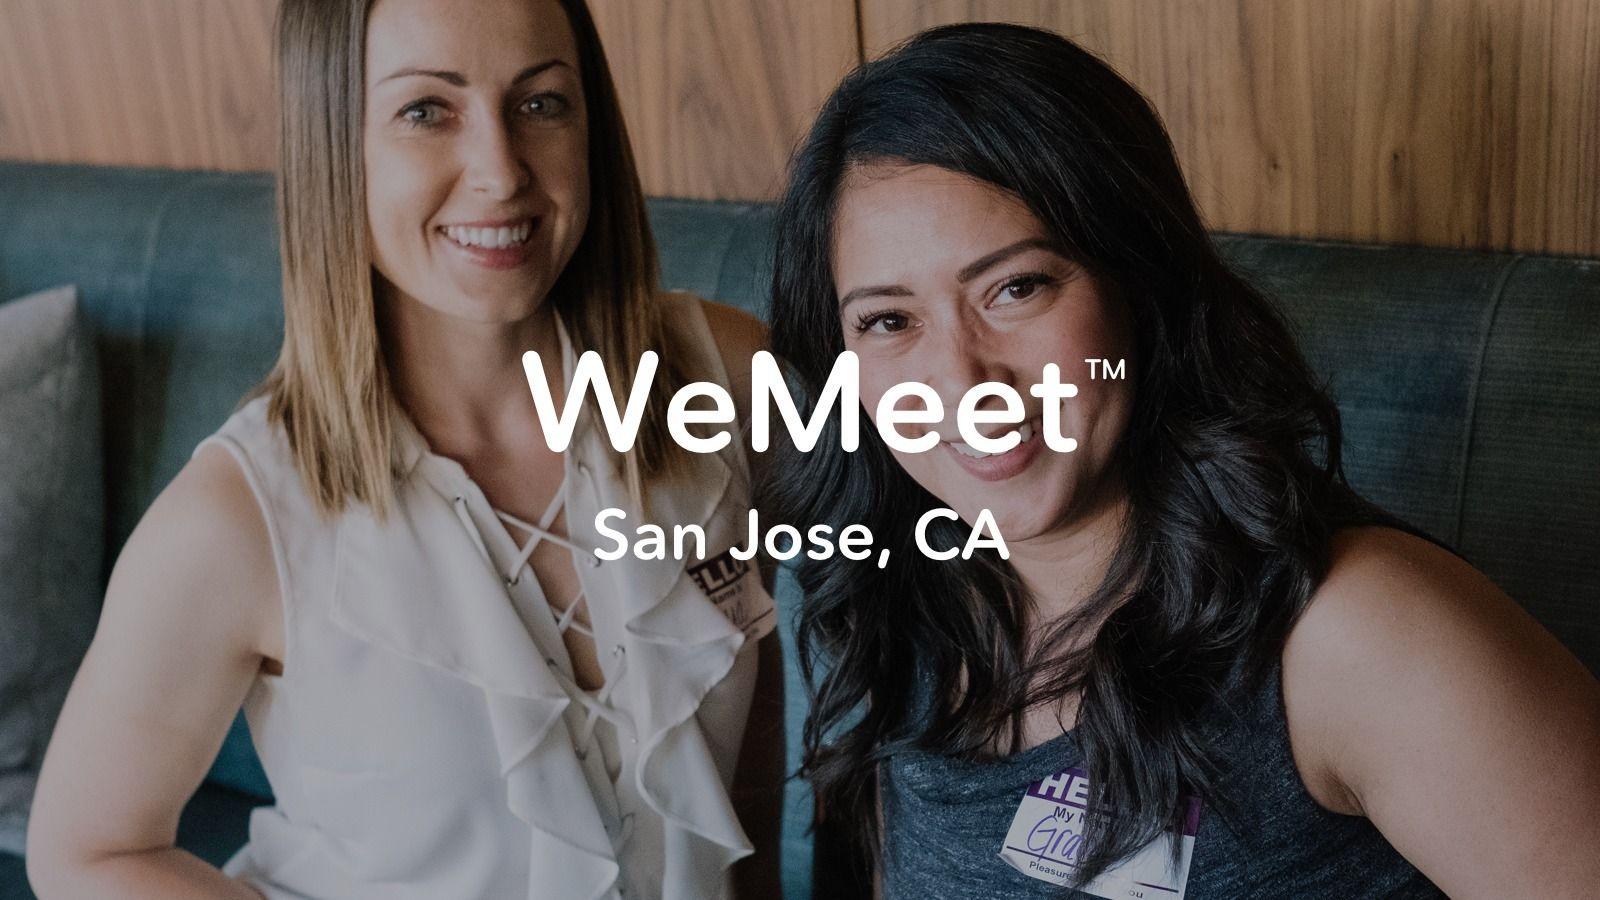 WeMeet San Jose Networking - Meet New People